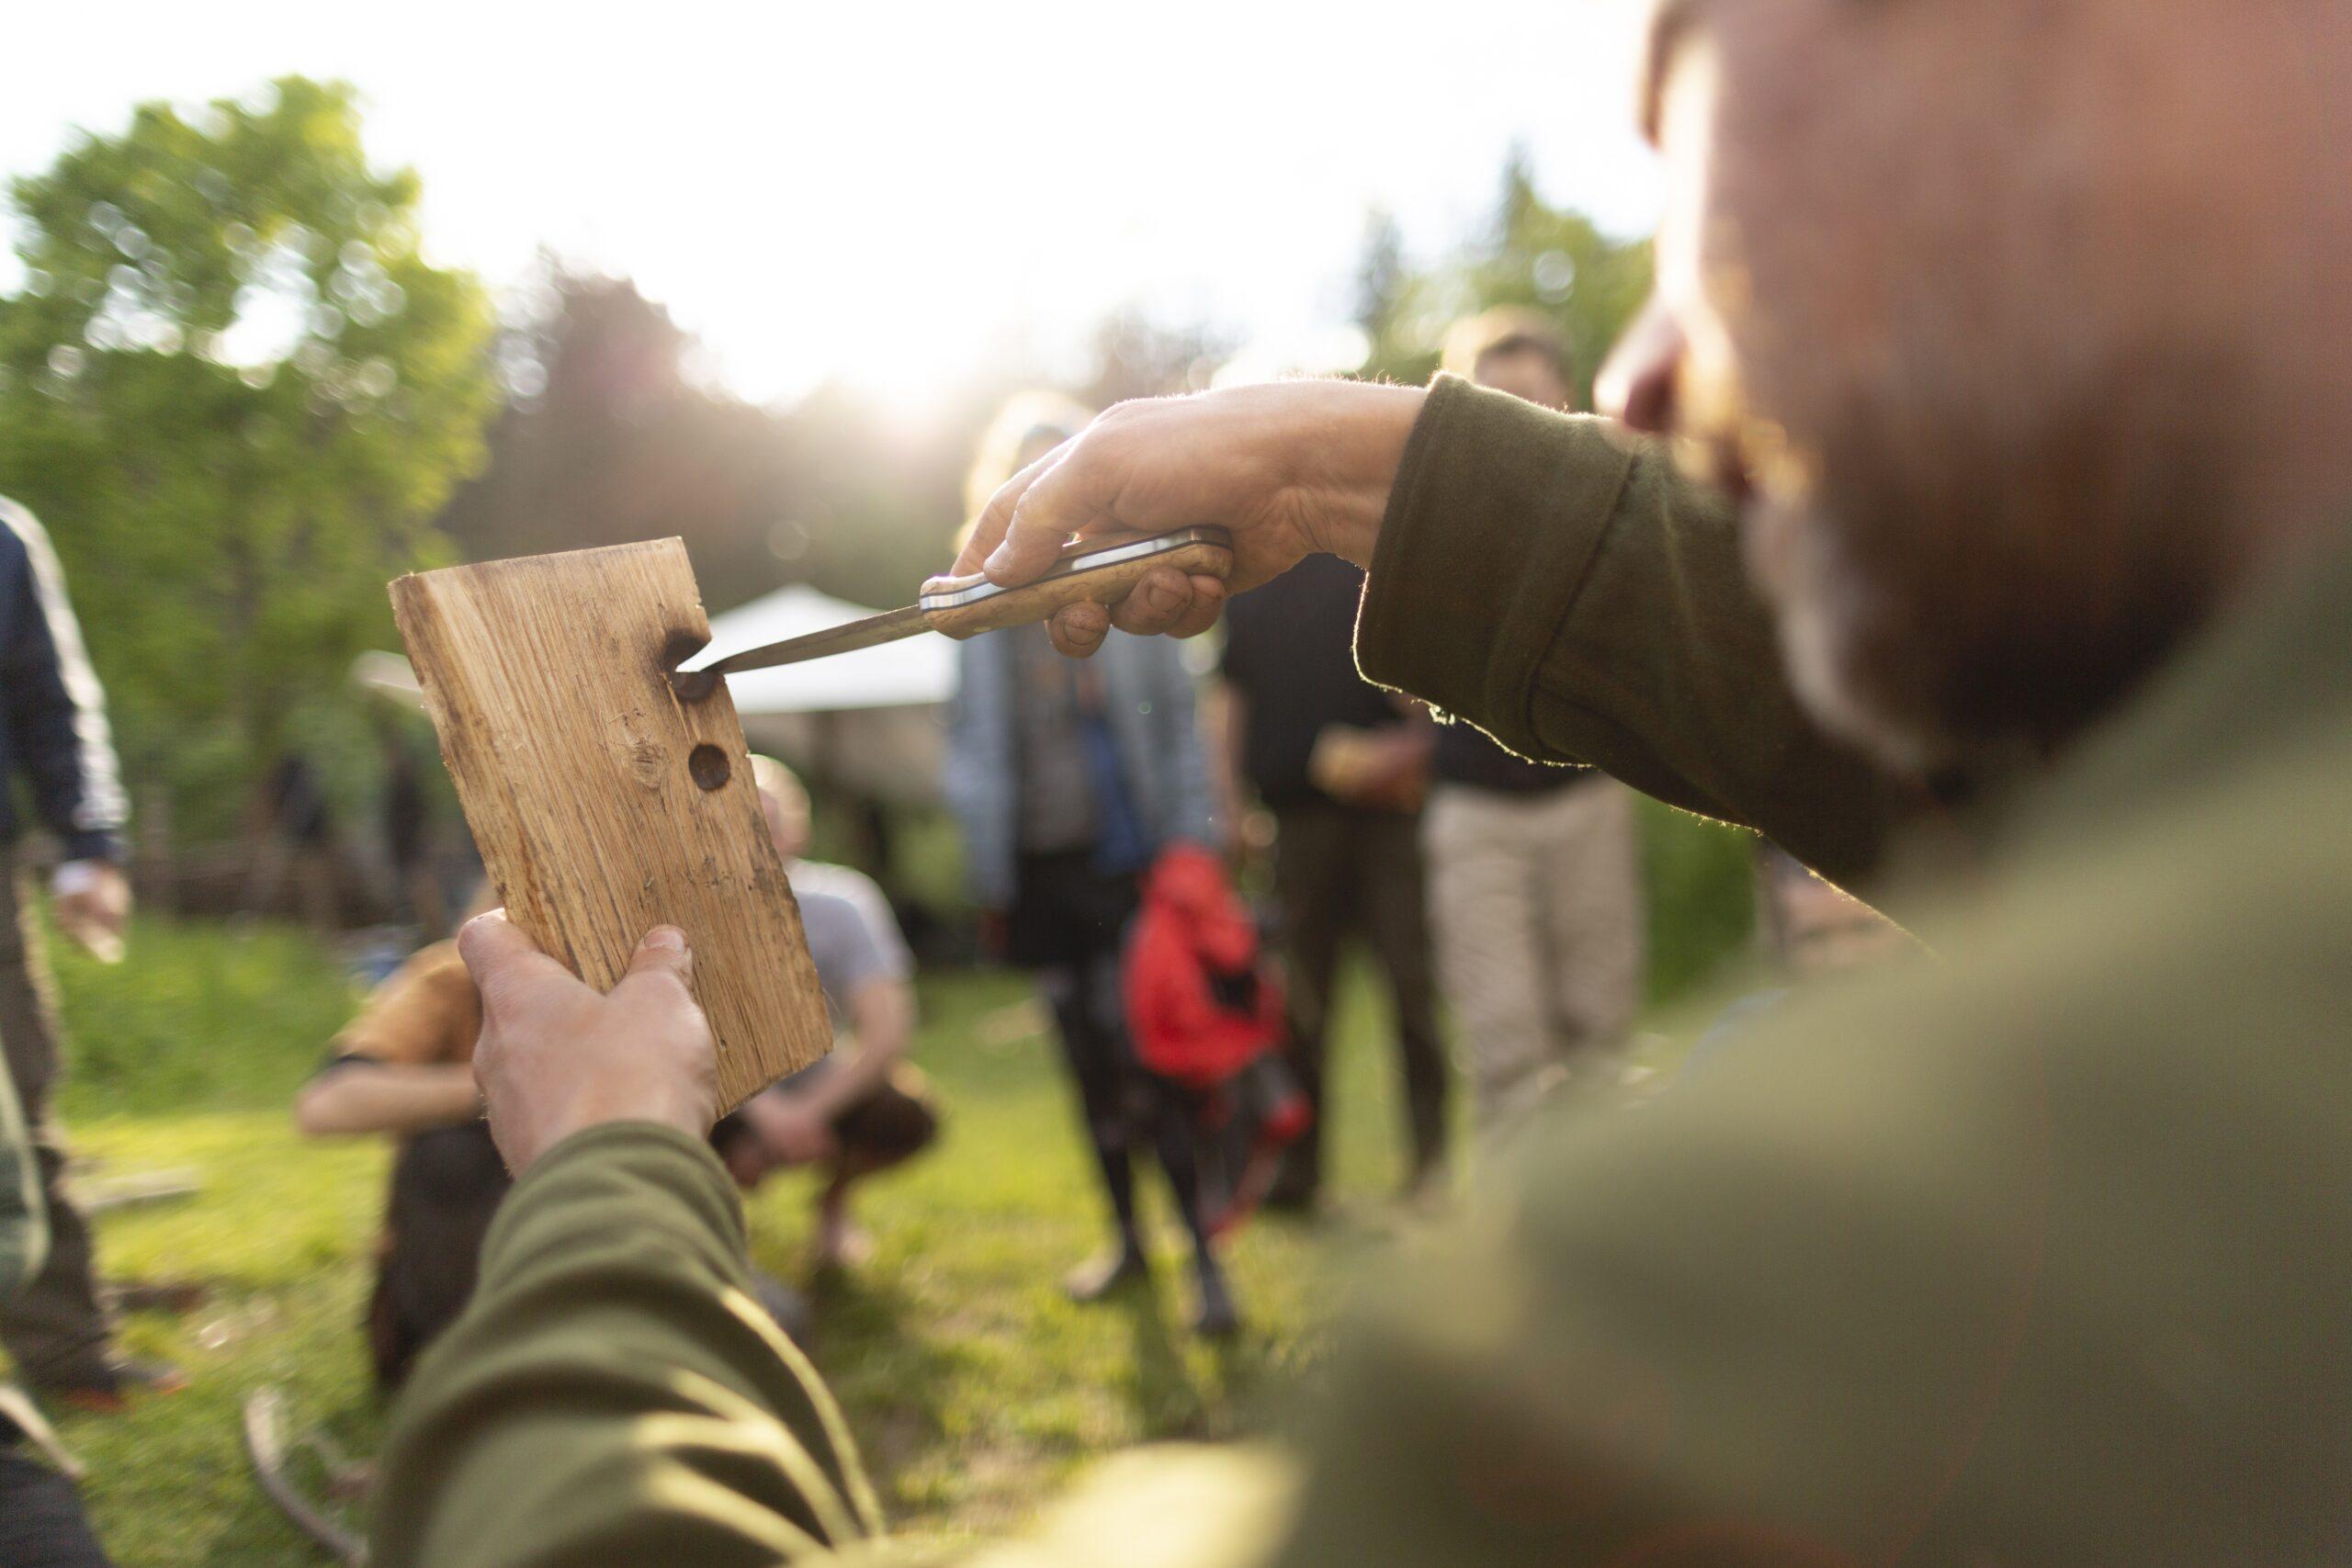 Wildnispädagogik-Ausbildung: Feuerbohrer-Set bauen